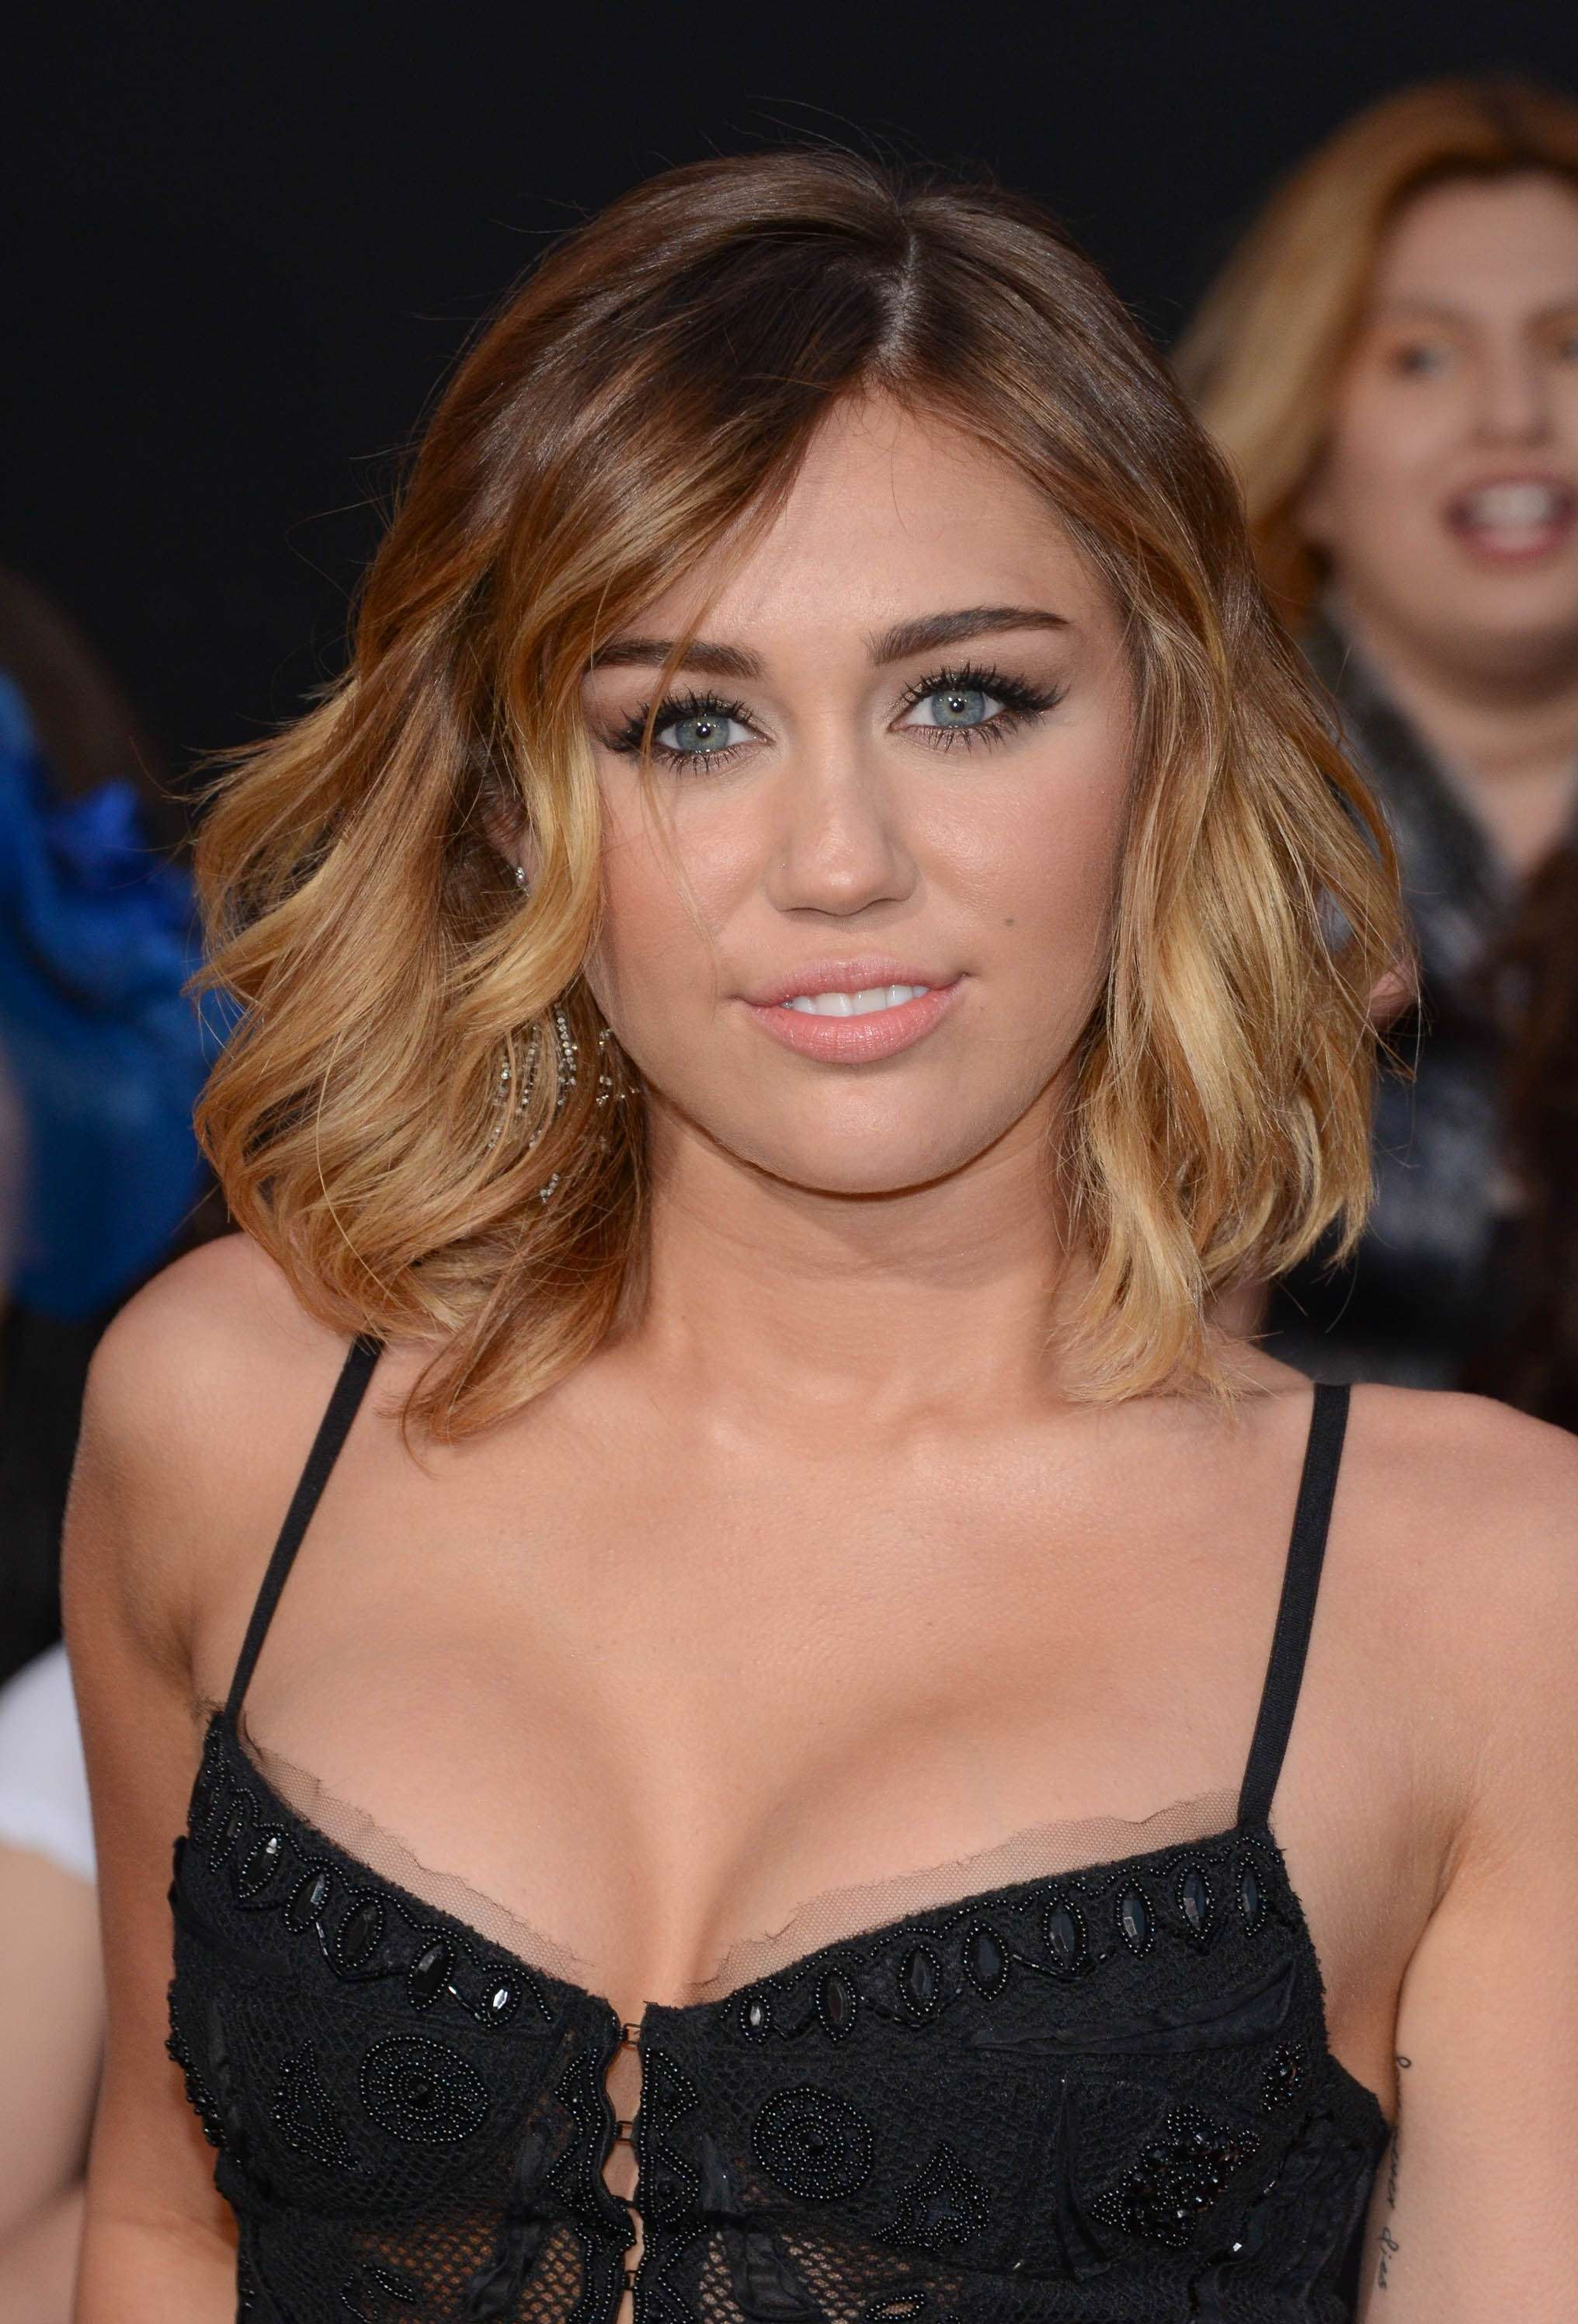 32759_Miley_Cyrus_Adds3_123_67lo.jpg